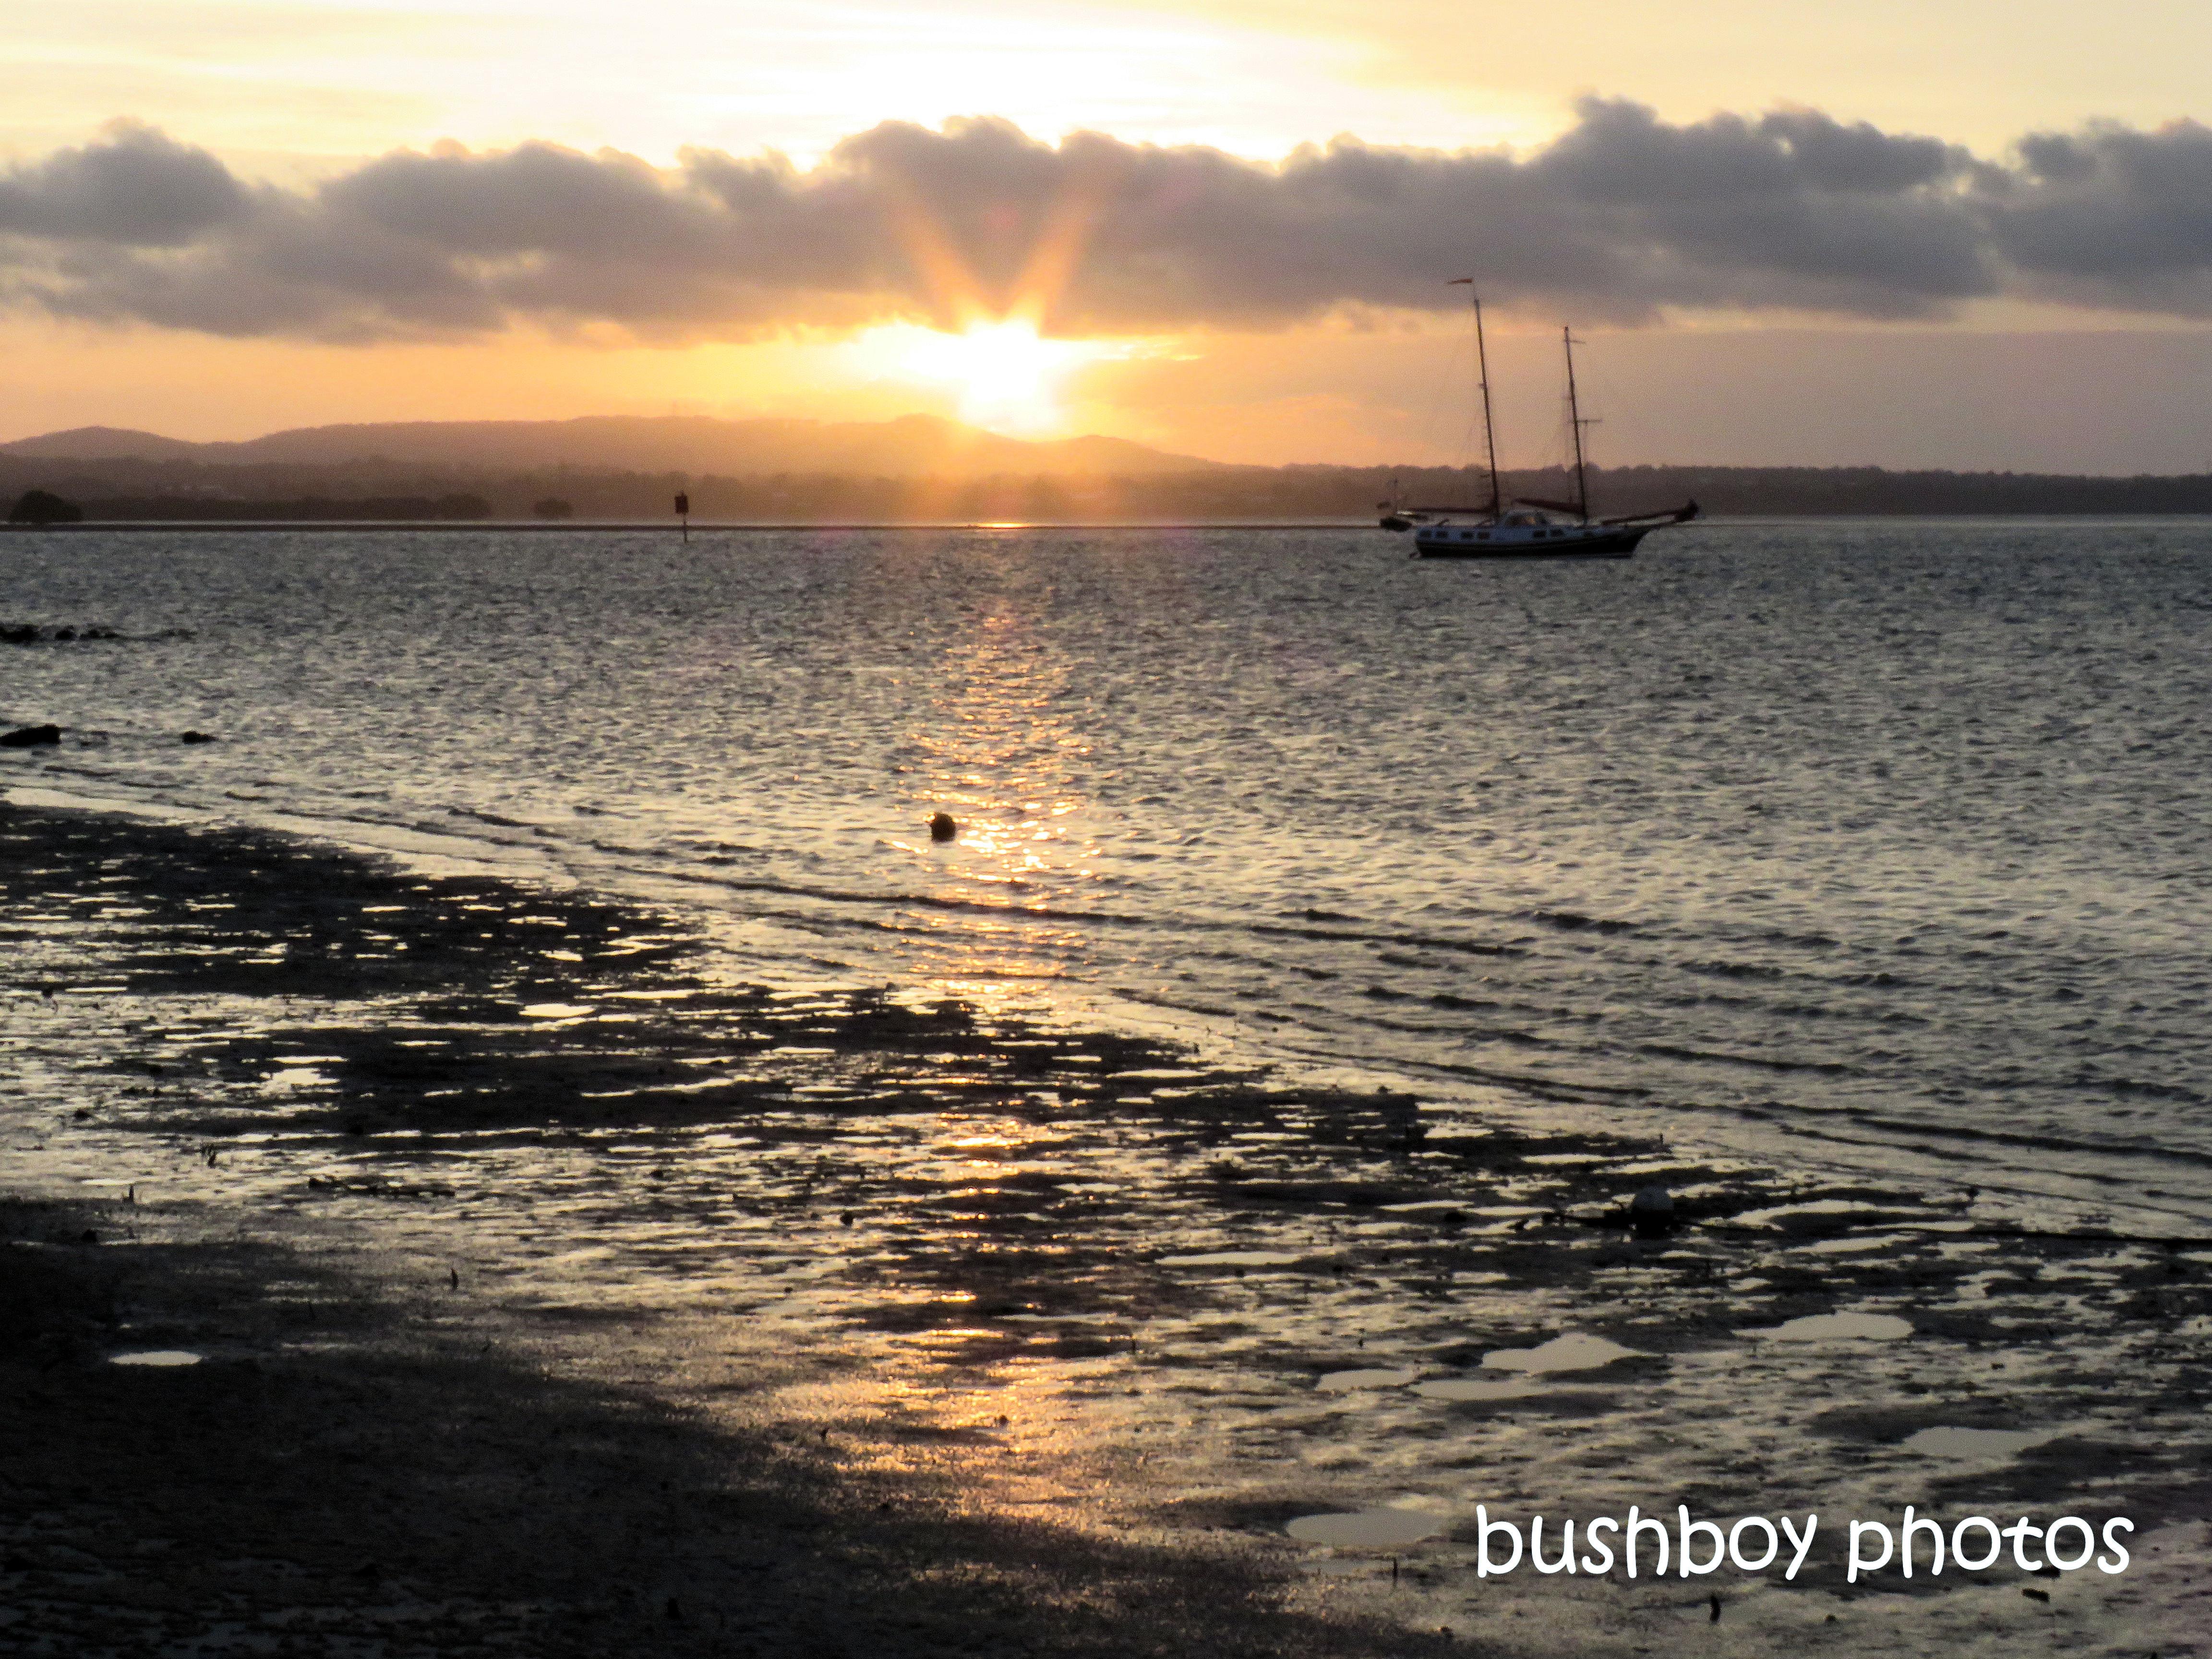 190730_blog_challenge_seascape_lakeside_macleay_island_yatch_sunset